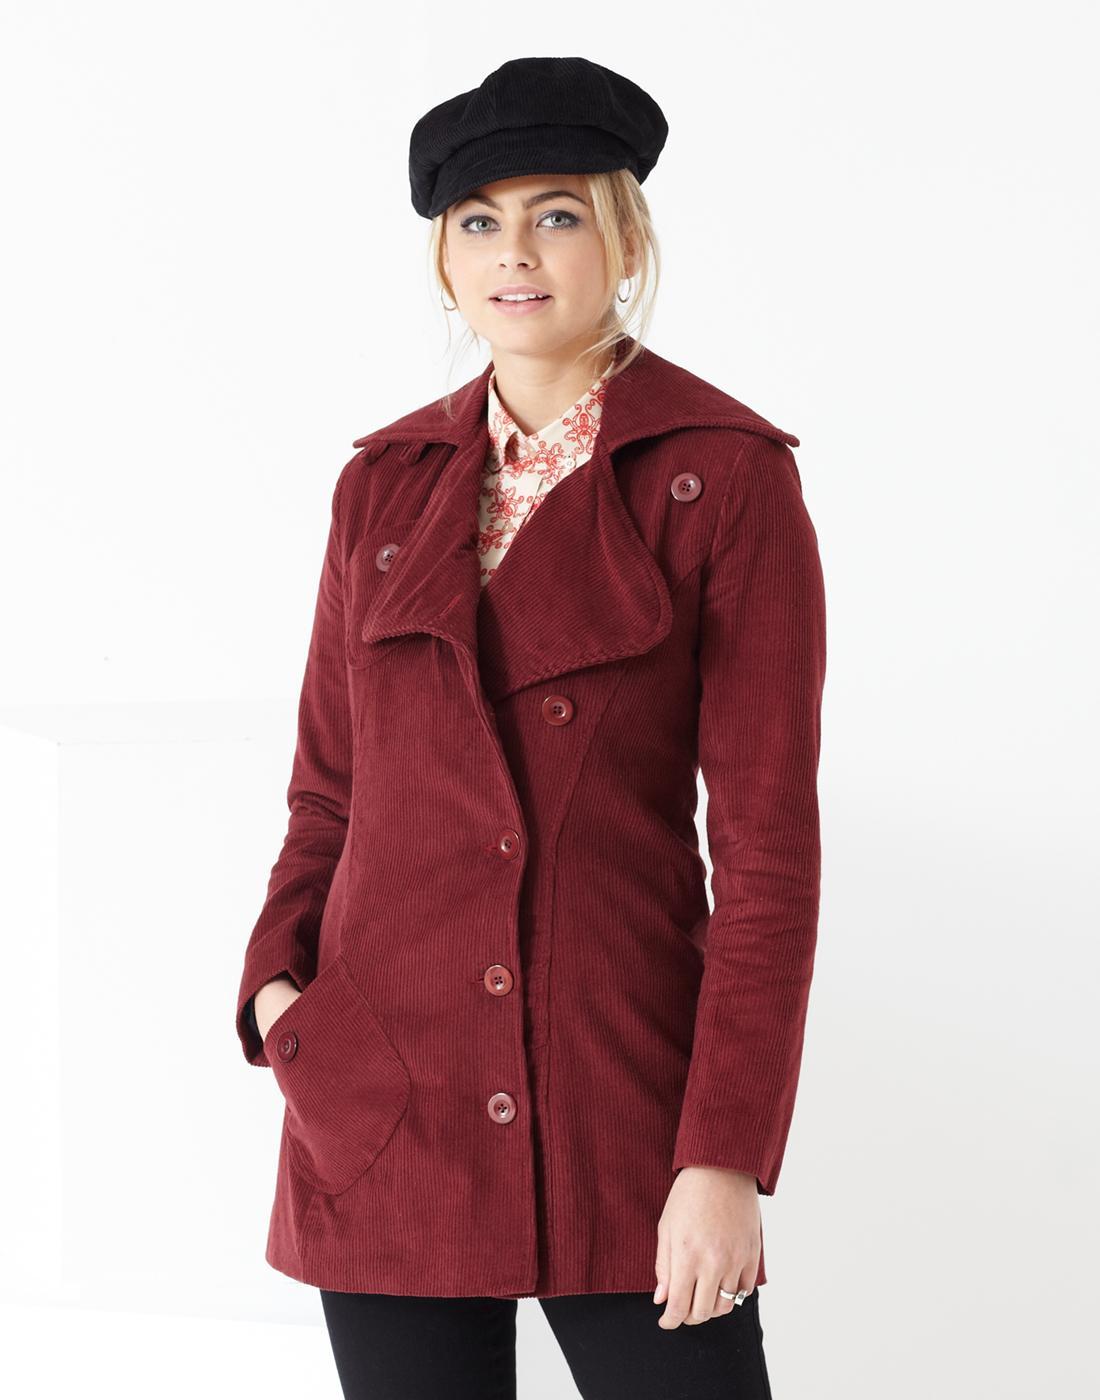 Grace MADCAP ENGLAND Retro 60s Mod Corduroy Coat